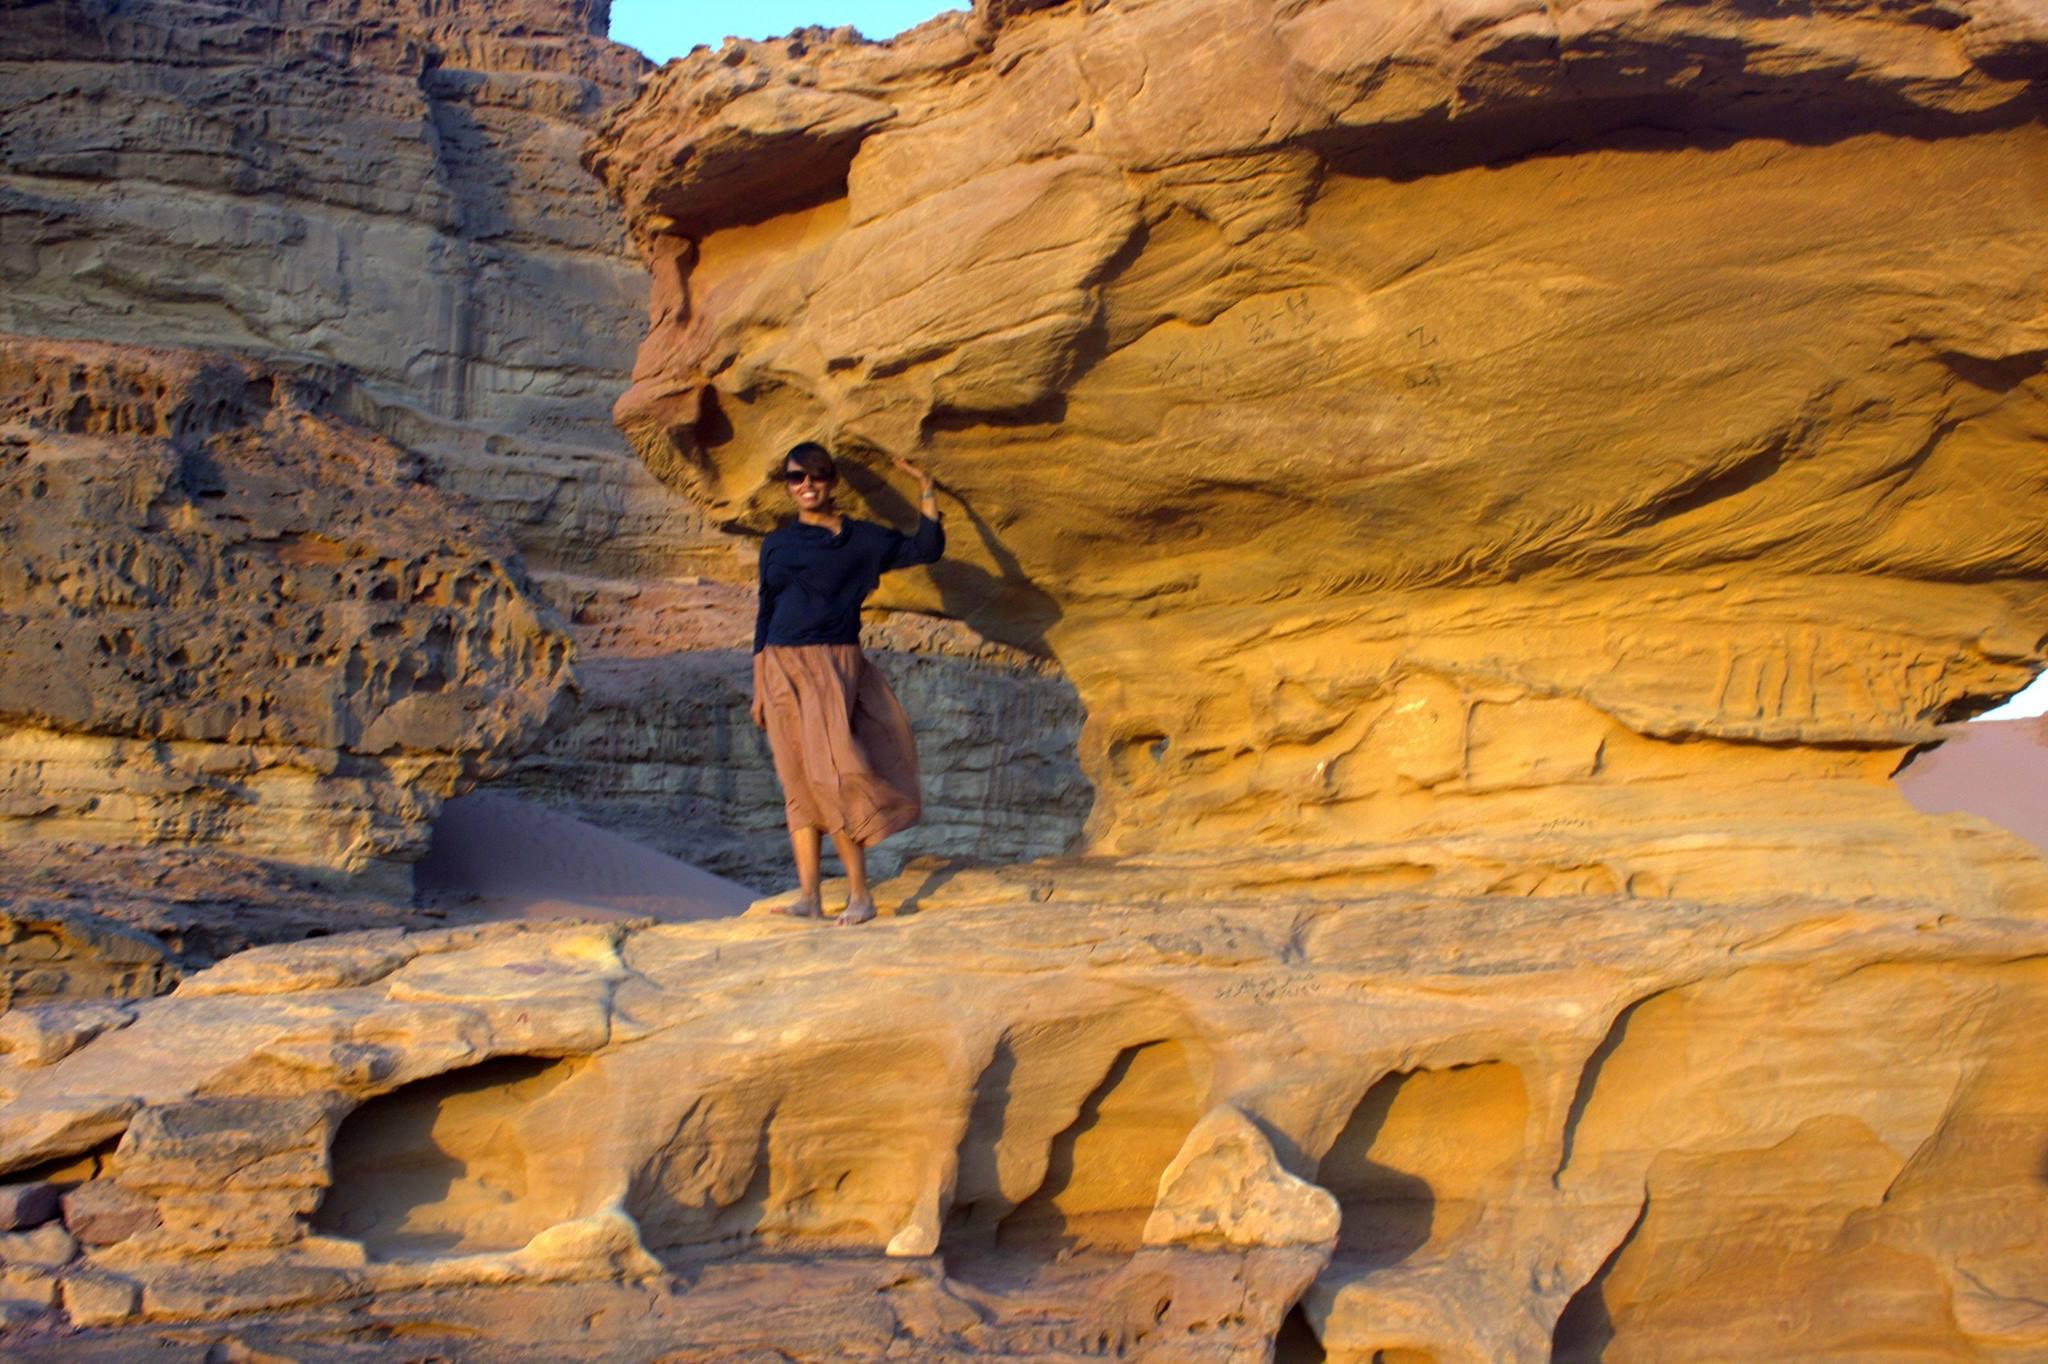 #Jordantourism #wadirum